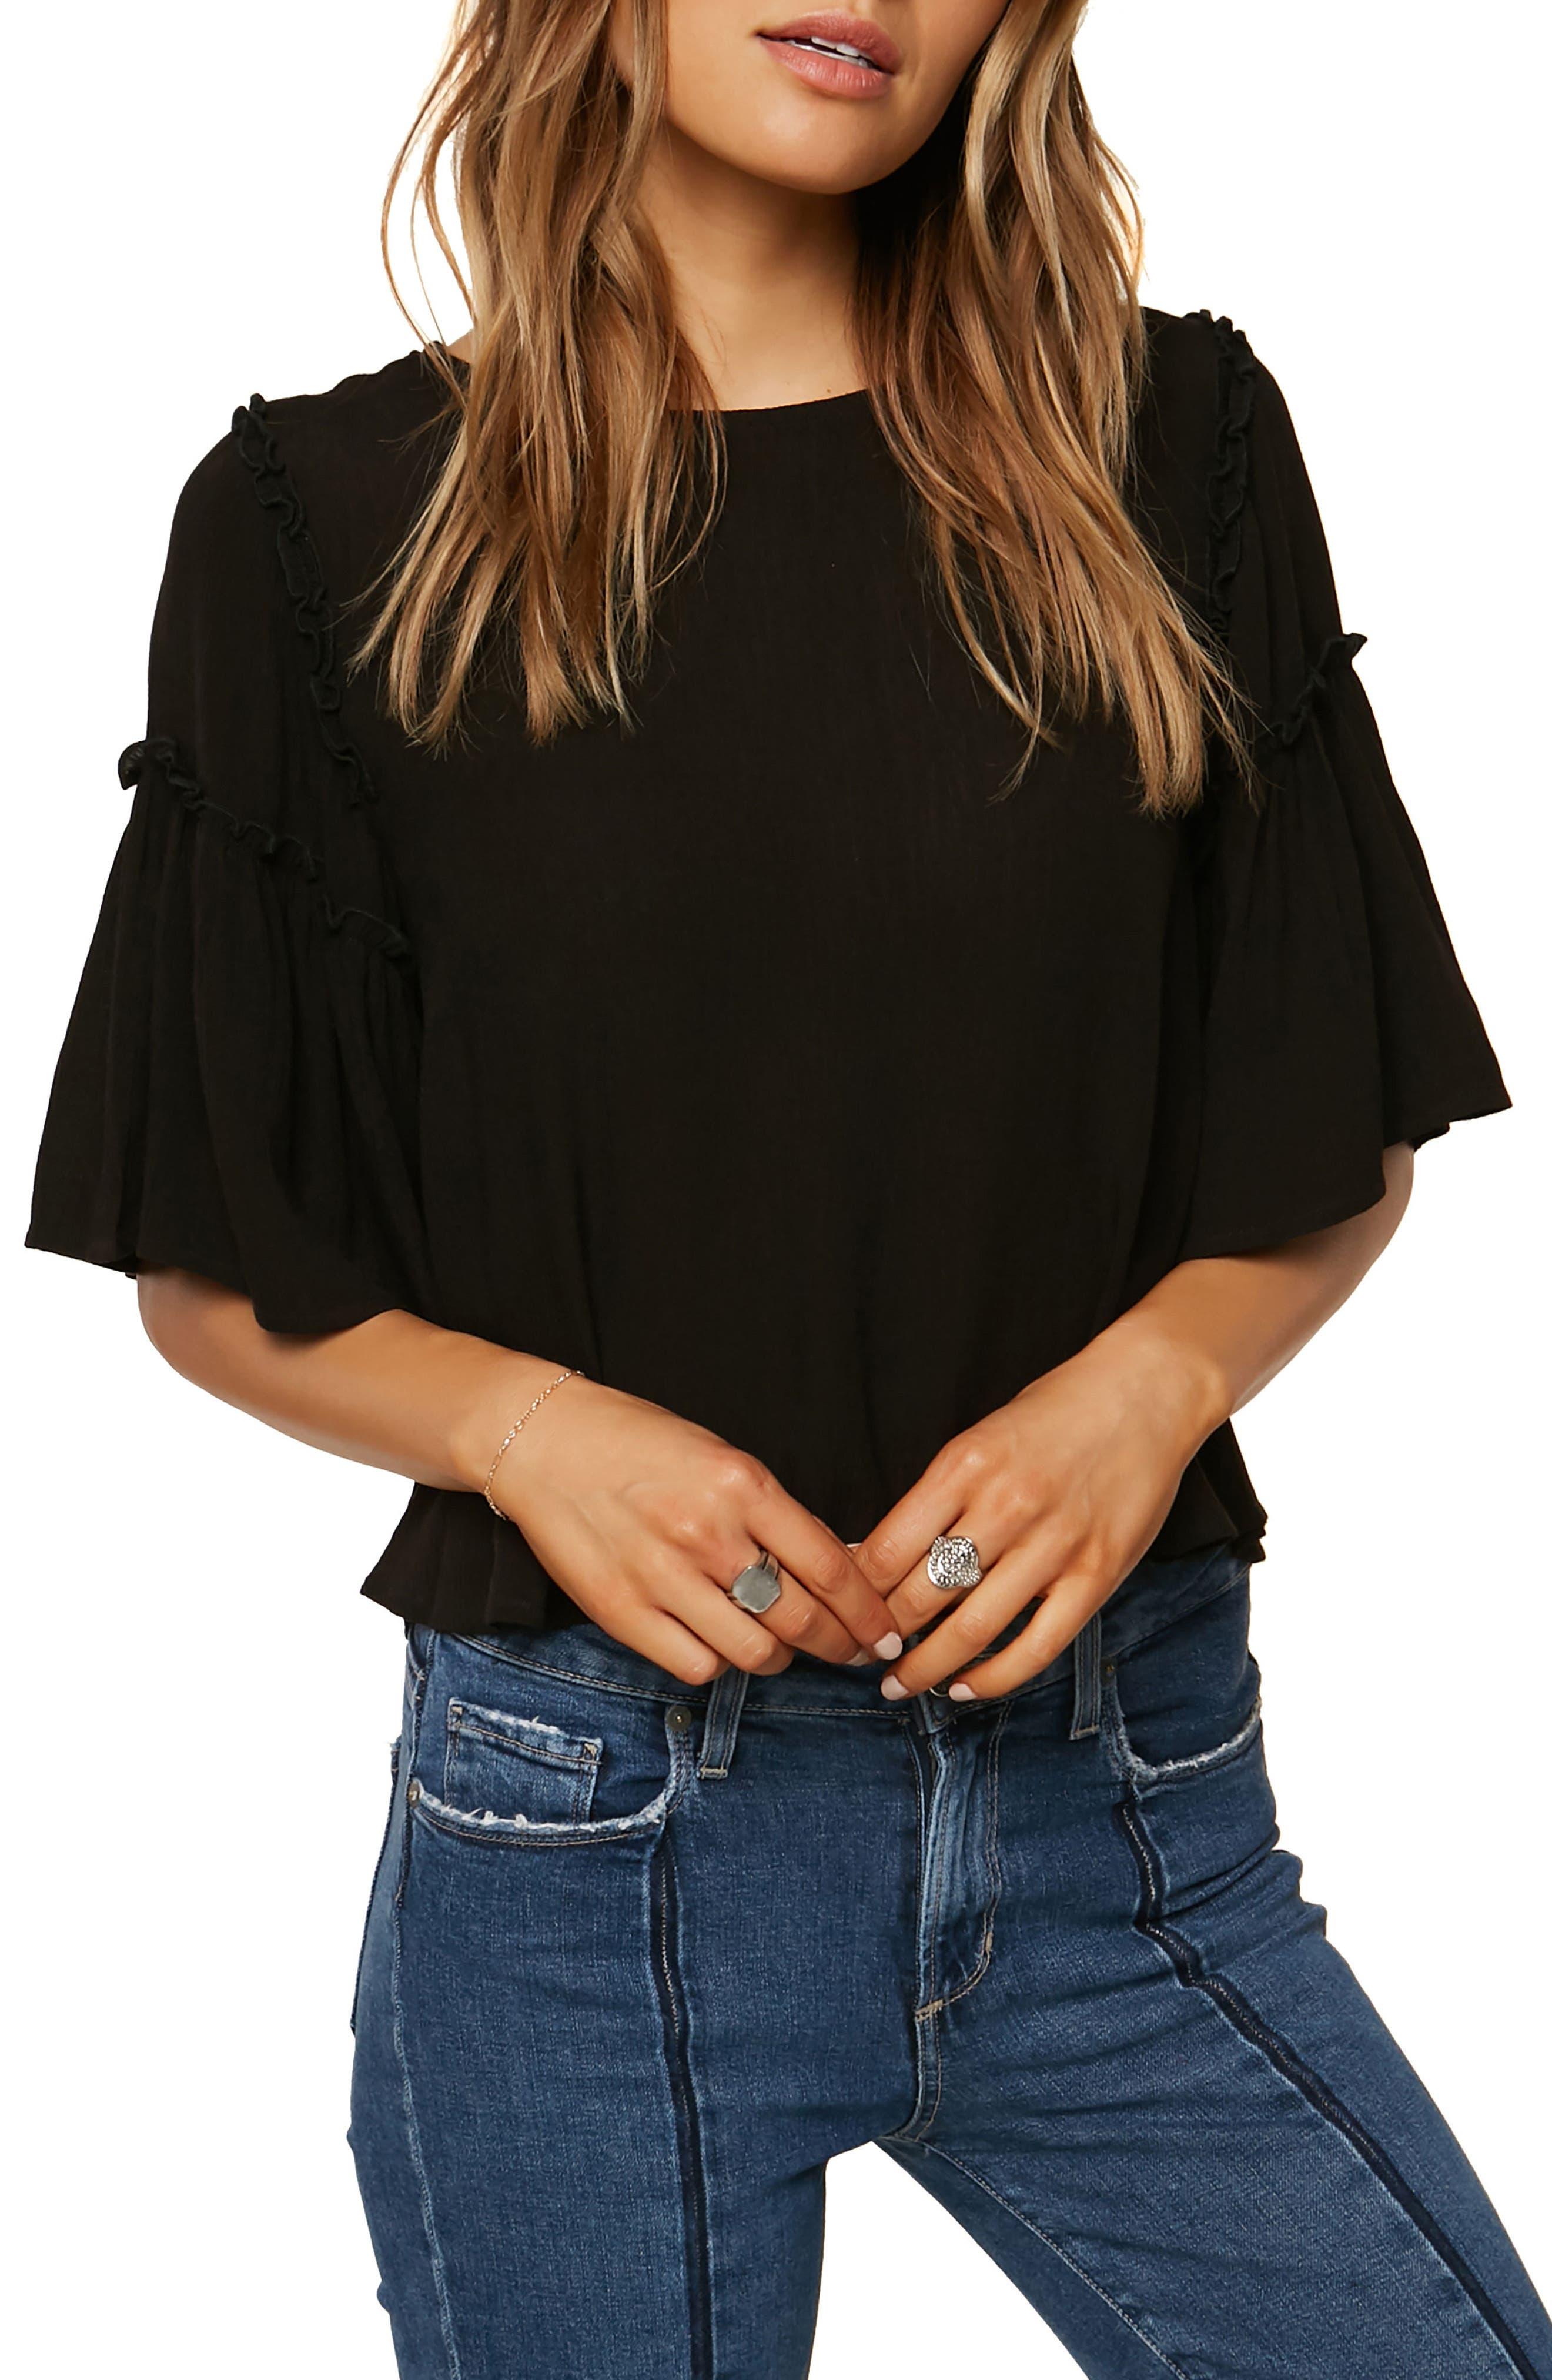 Brea Bell Sleeve Top,                             Main thumbnail 1, color,                             001